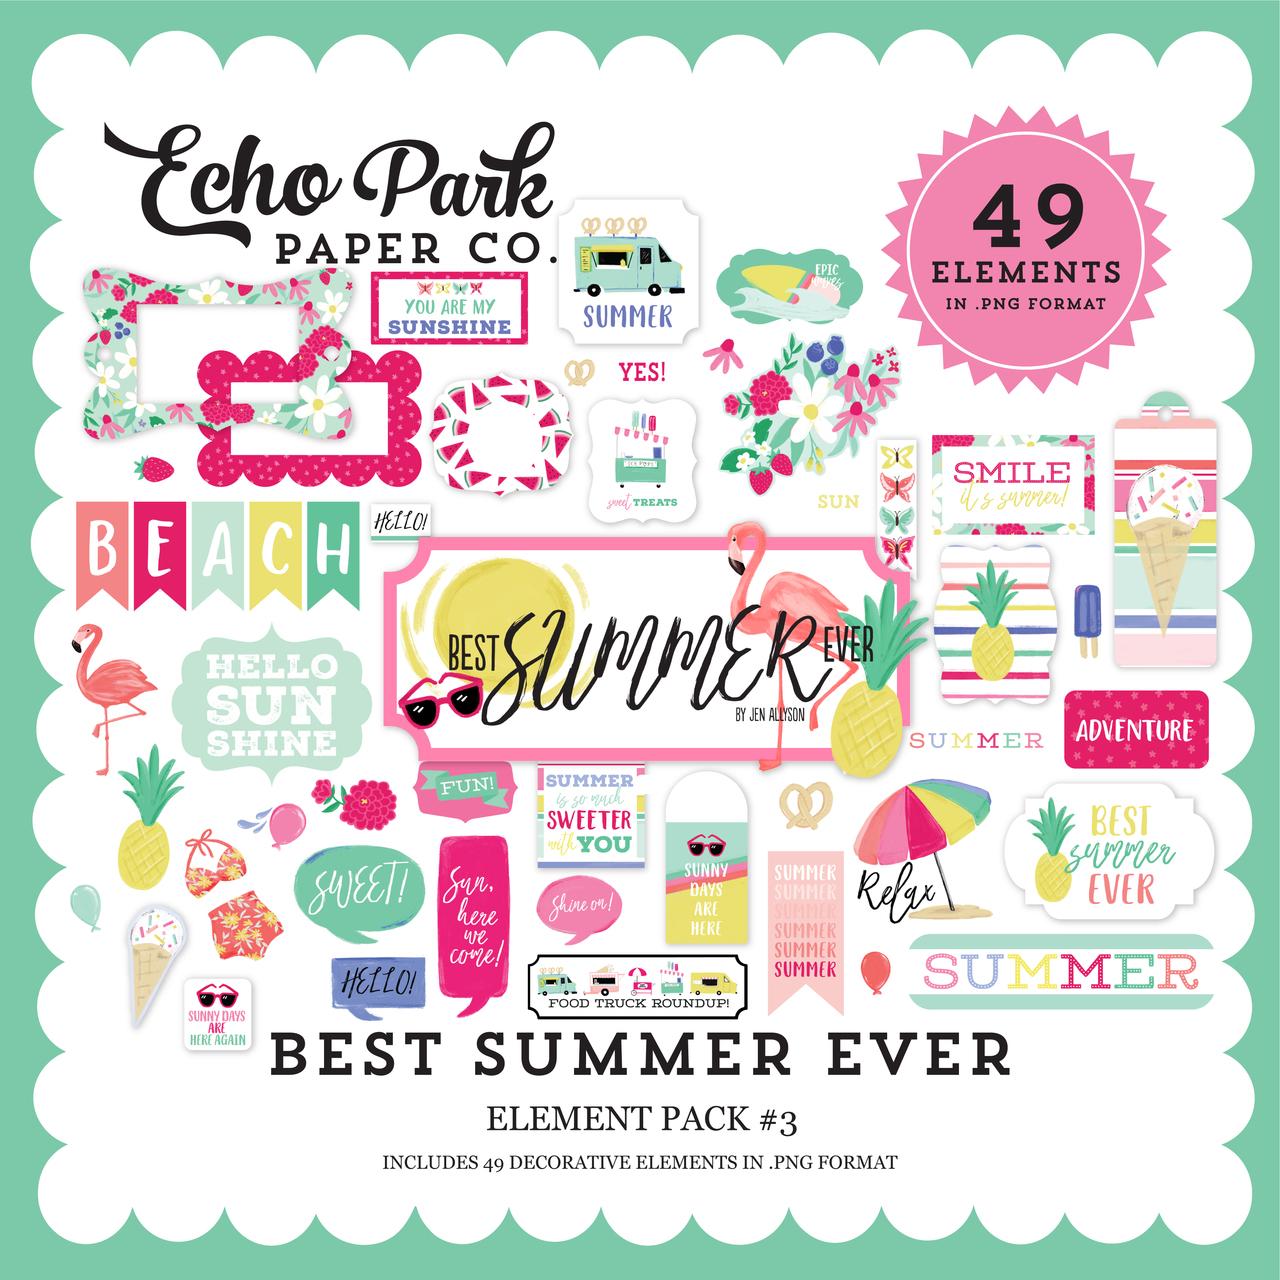 Best Summer Ever Element Pack #3